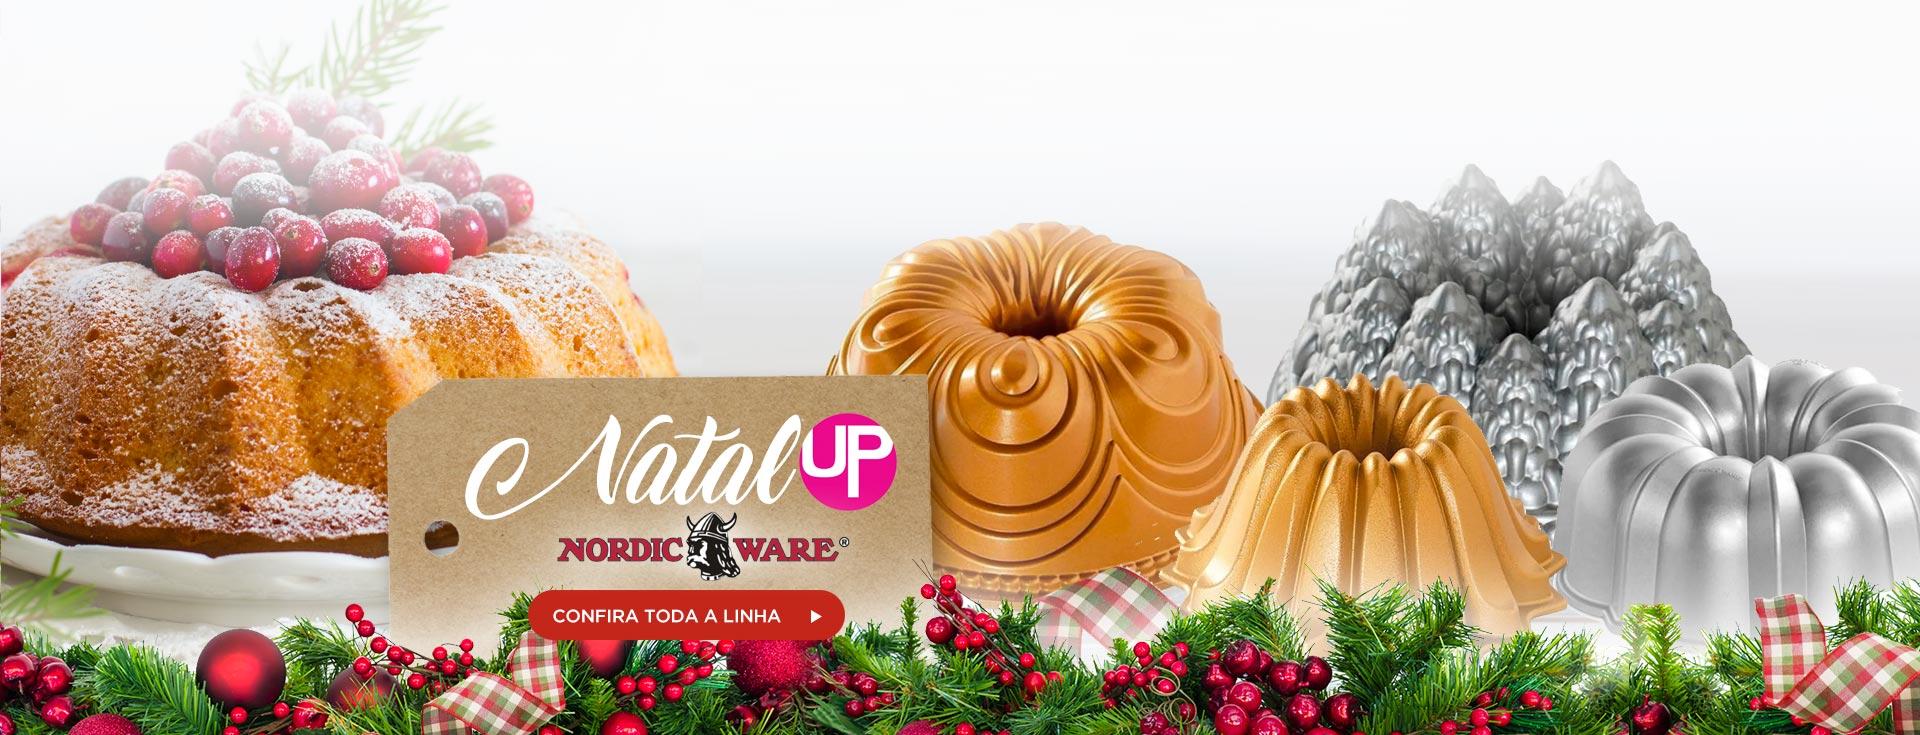 Natal - Nordic Ware